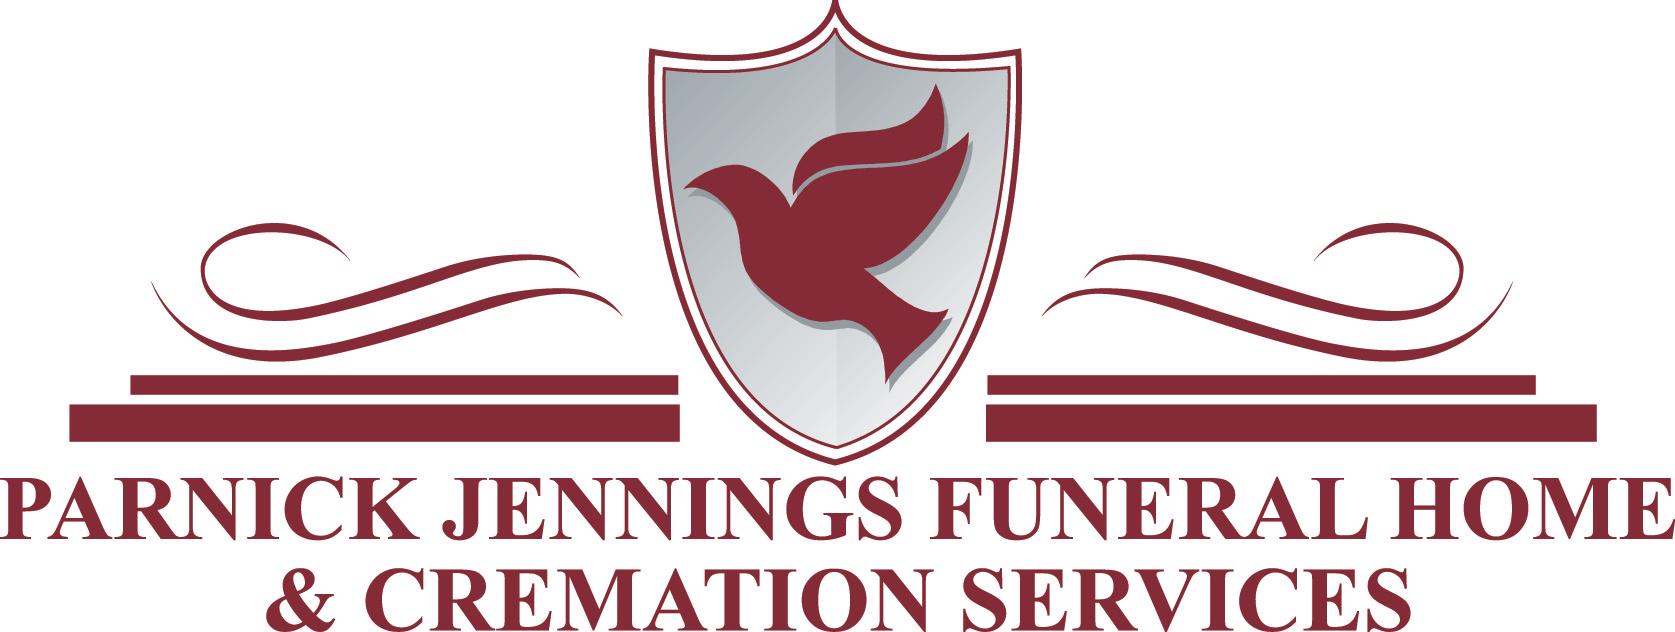 Collins Funeral Home Cartersville Ga